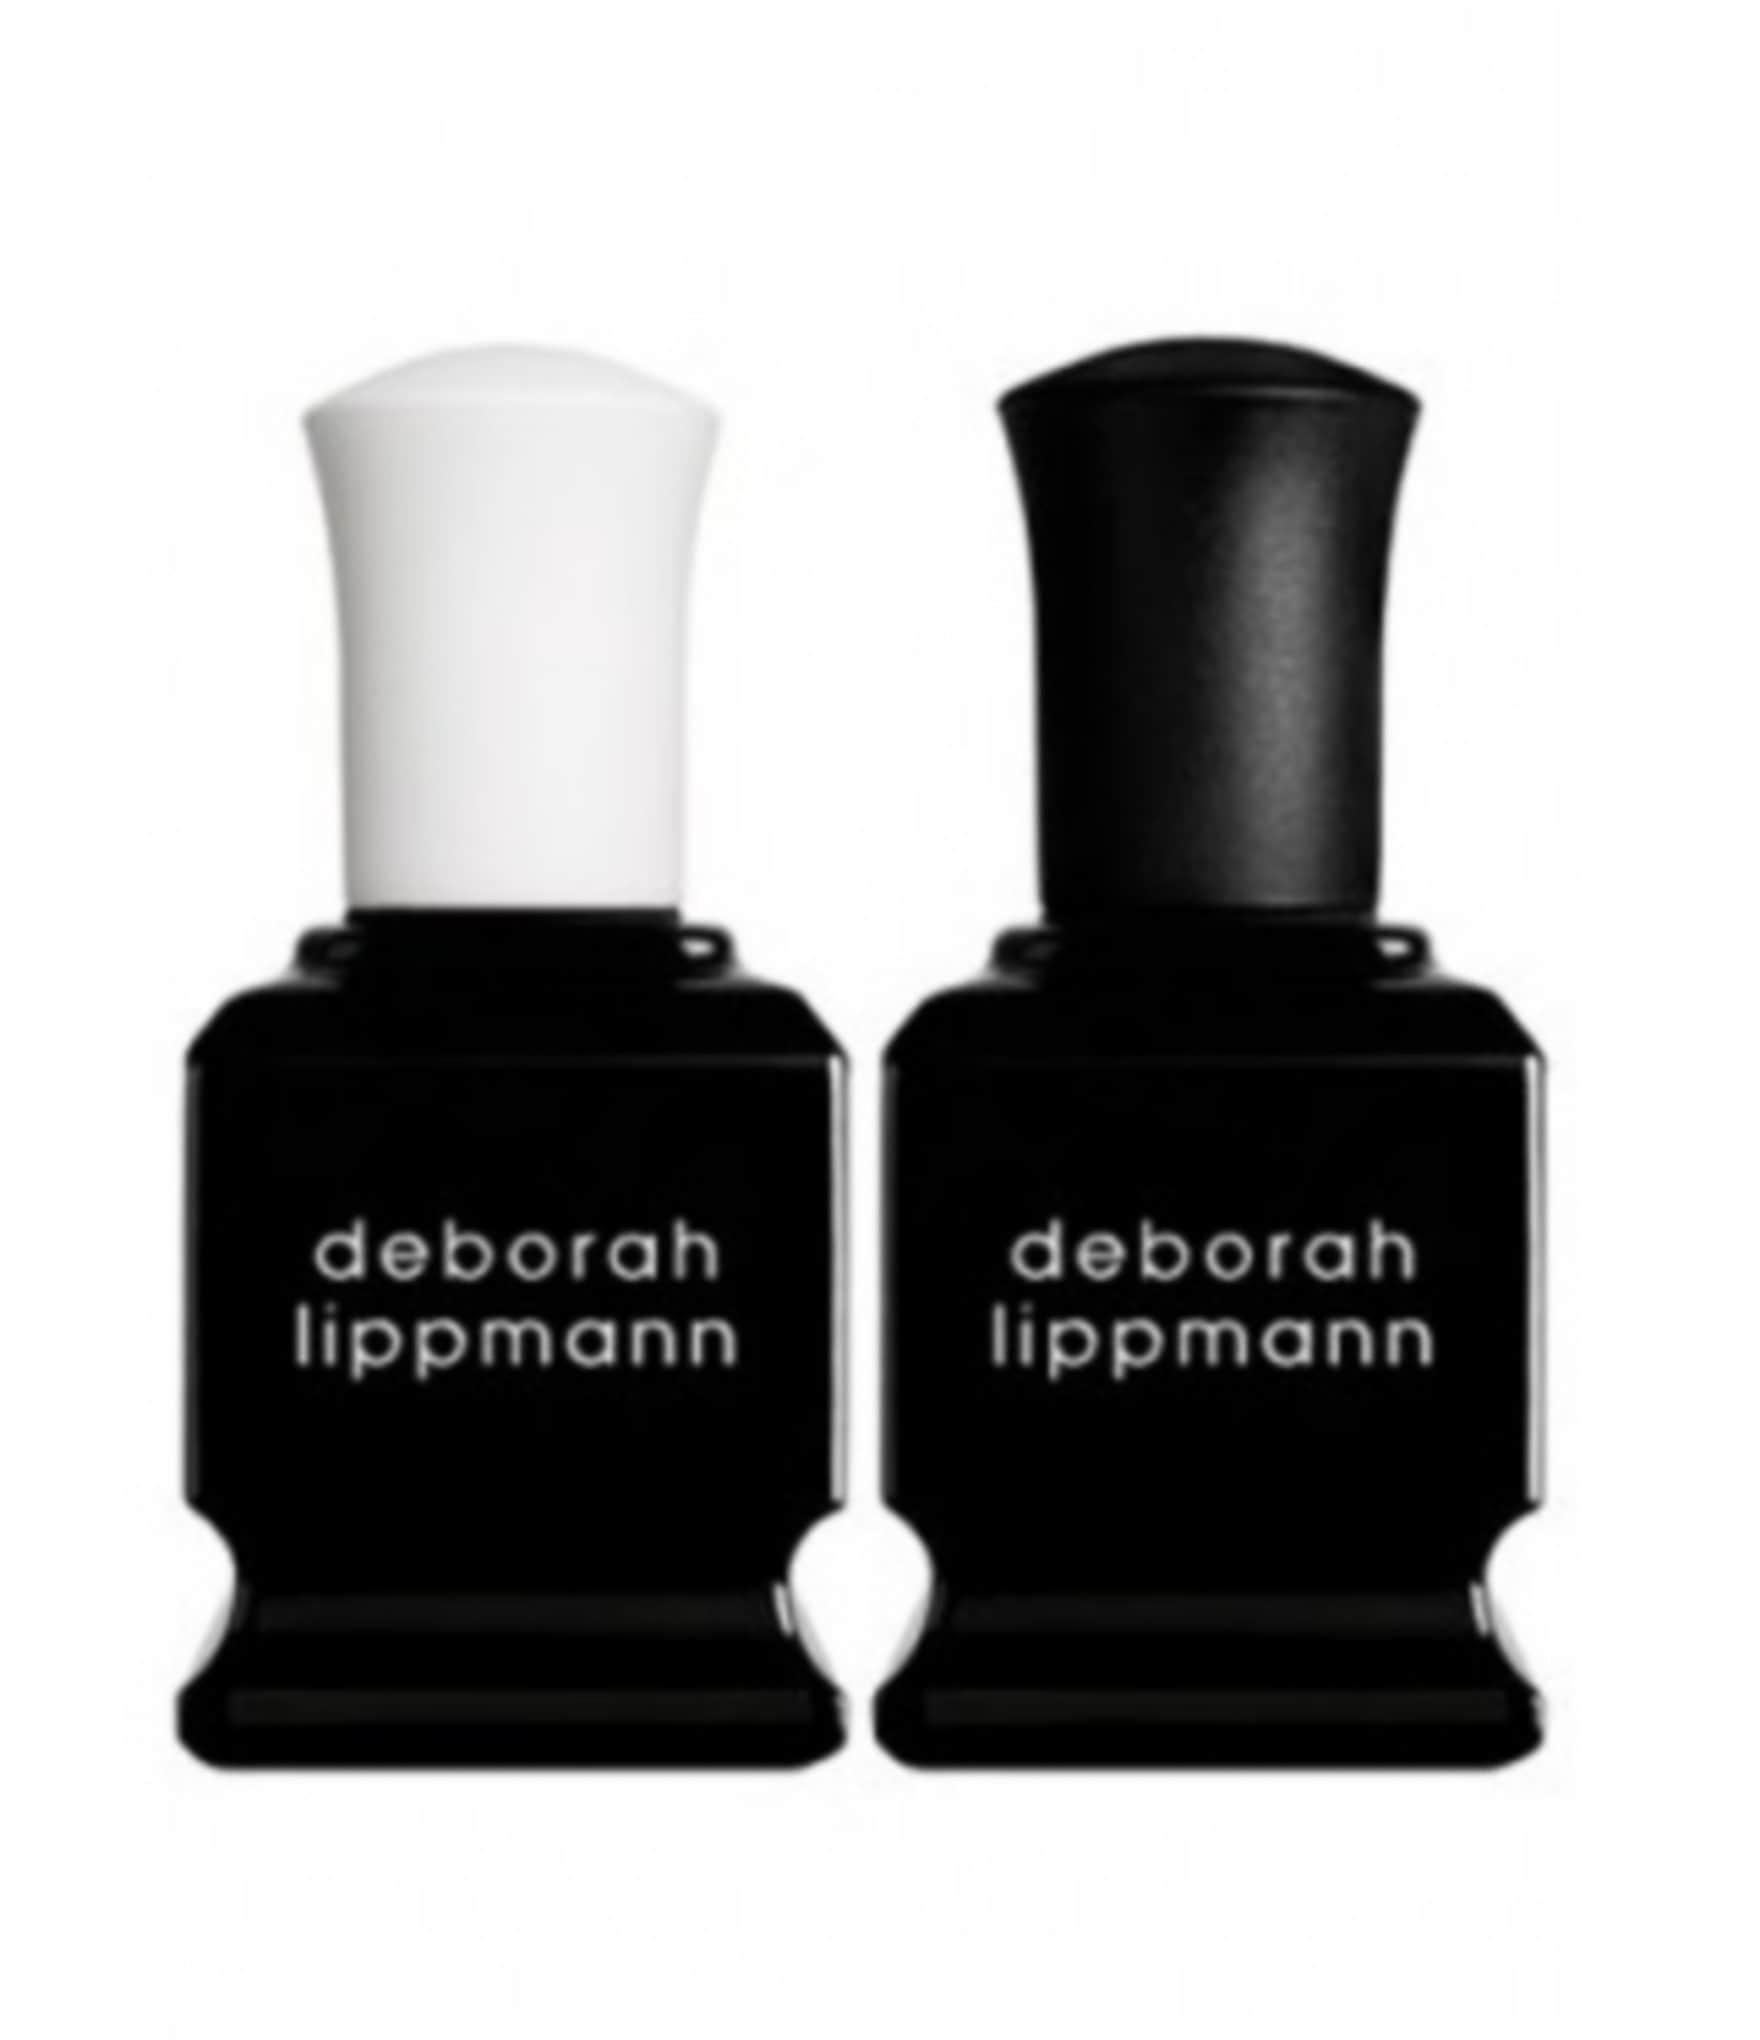 Deborah Lippmann Gel Lab Pro Dillards